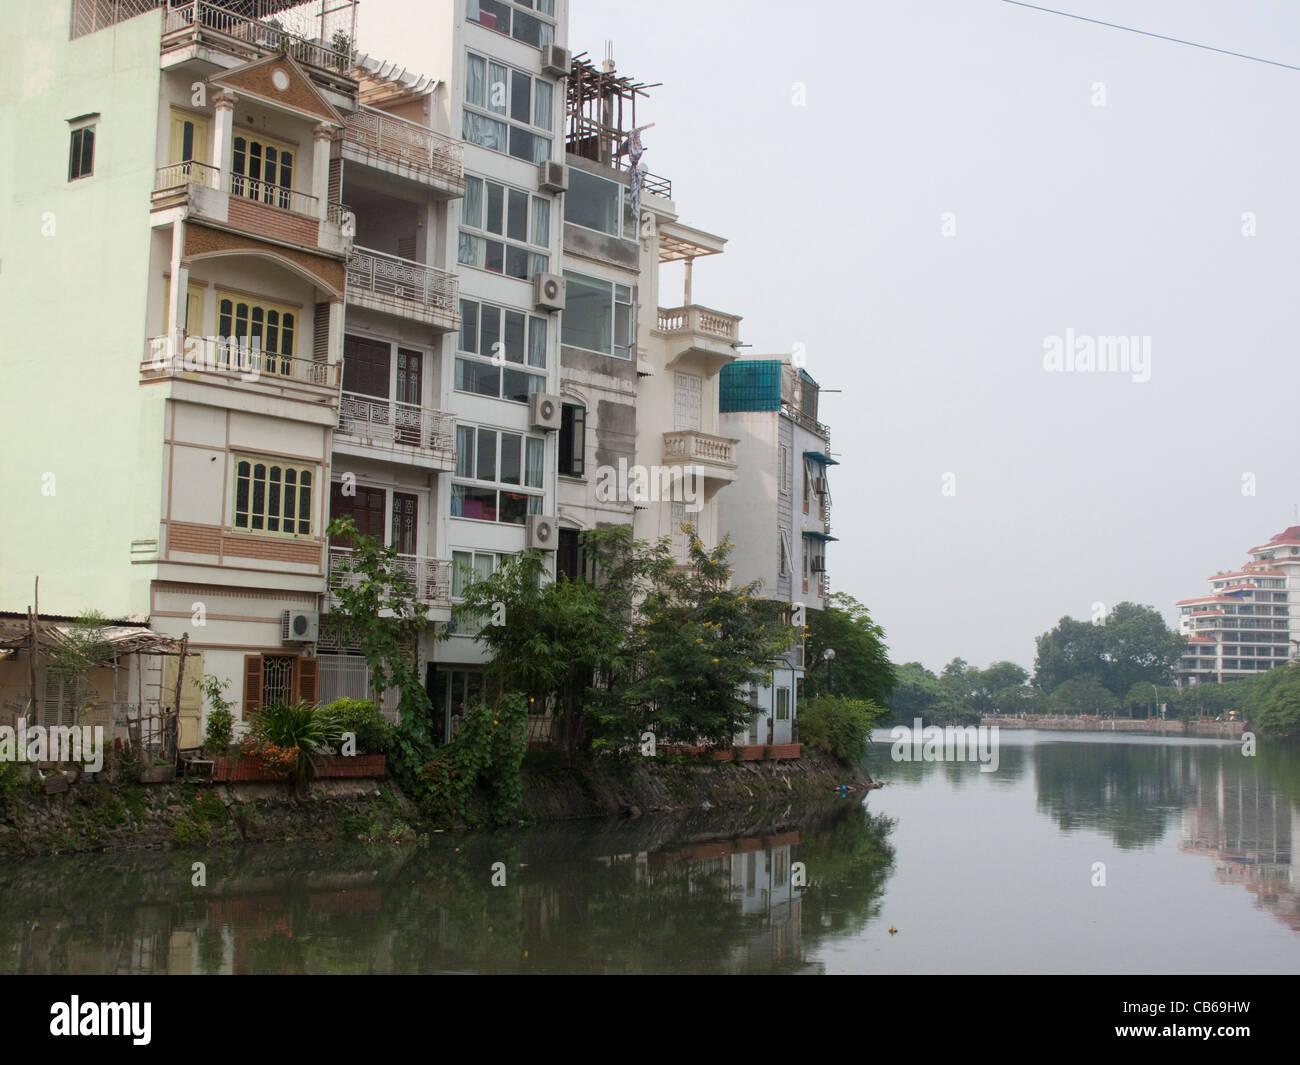 Houses on Truc Bach Lake in Hanoi, Vietnam - Stock Image